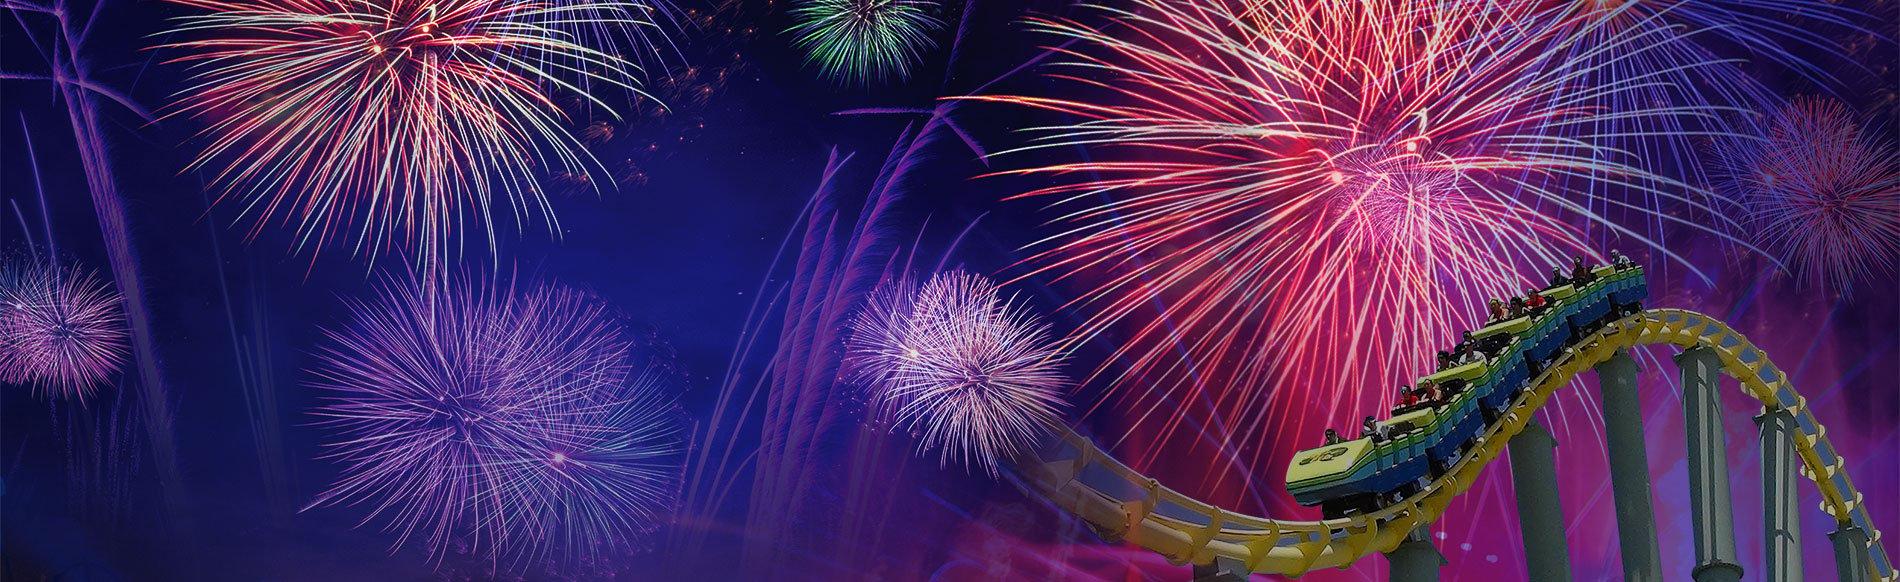 Fireworks Picnic